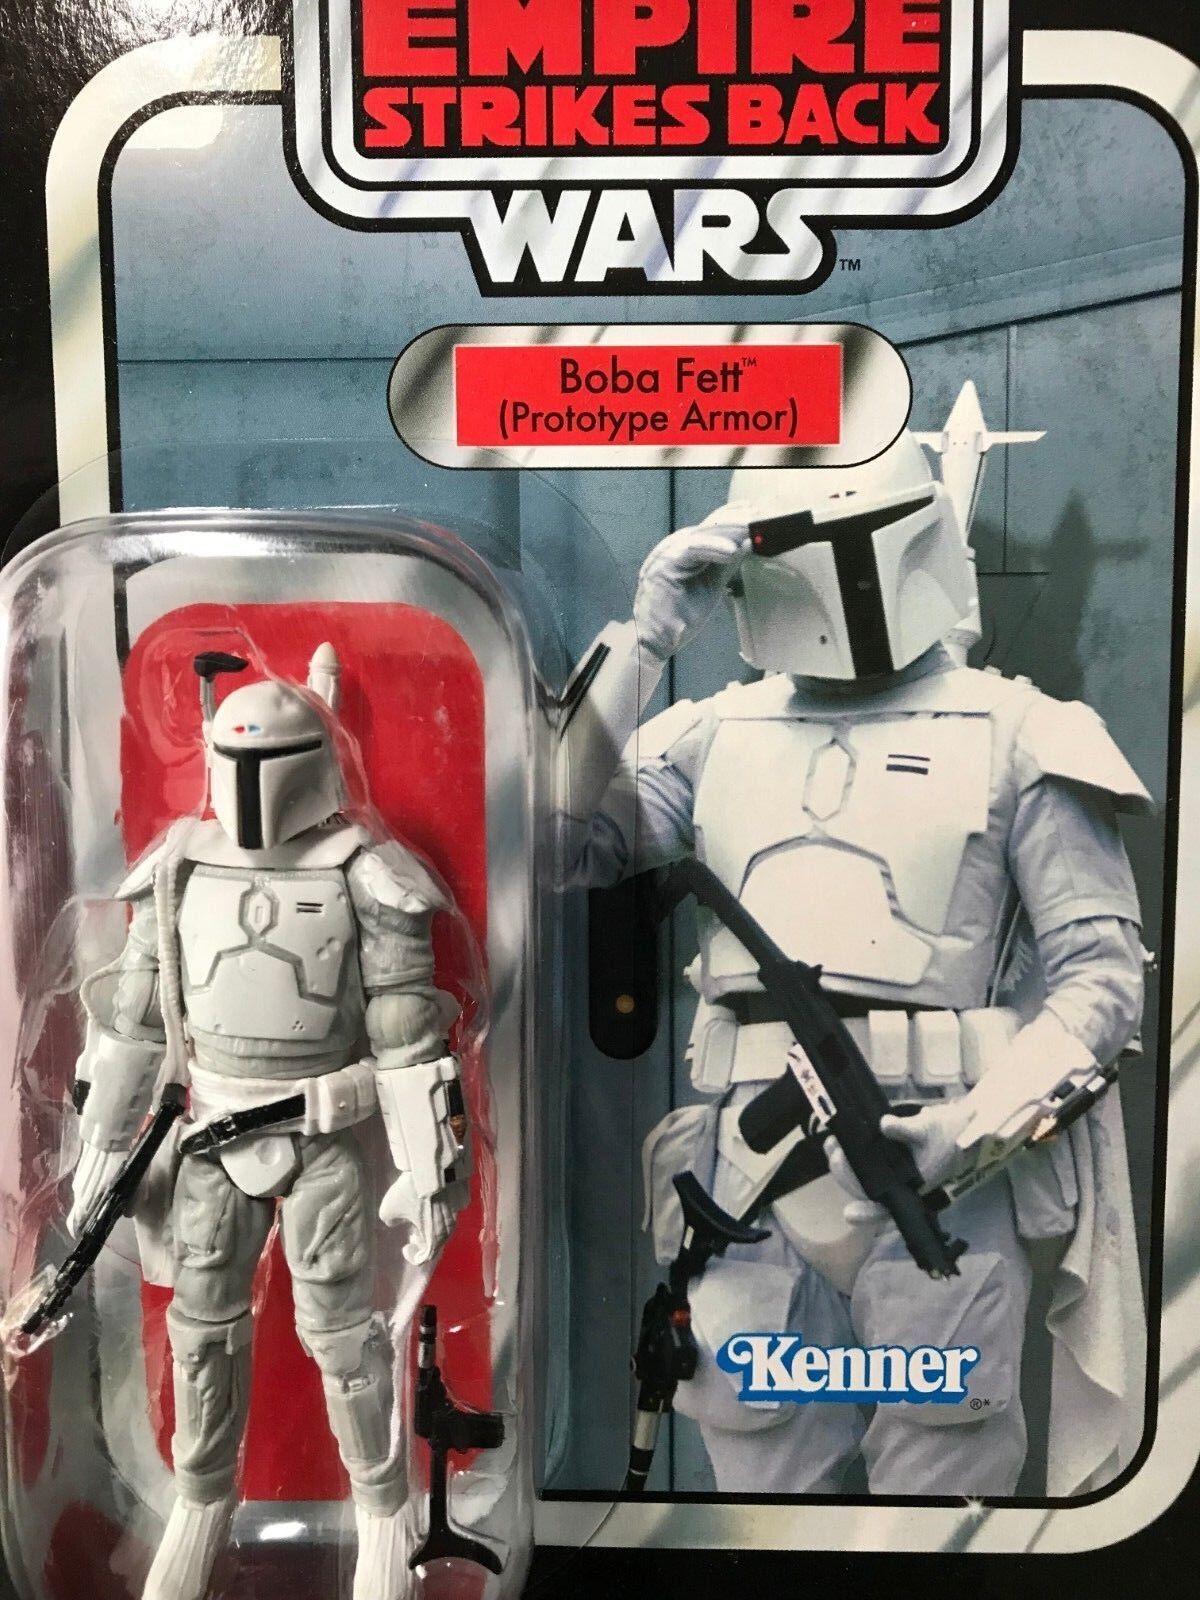 Hasbro Boba Fett Prougeotype Armor  VC61 Star Wars Vintage Collection Action Figure  mieux acheter